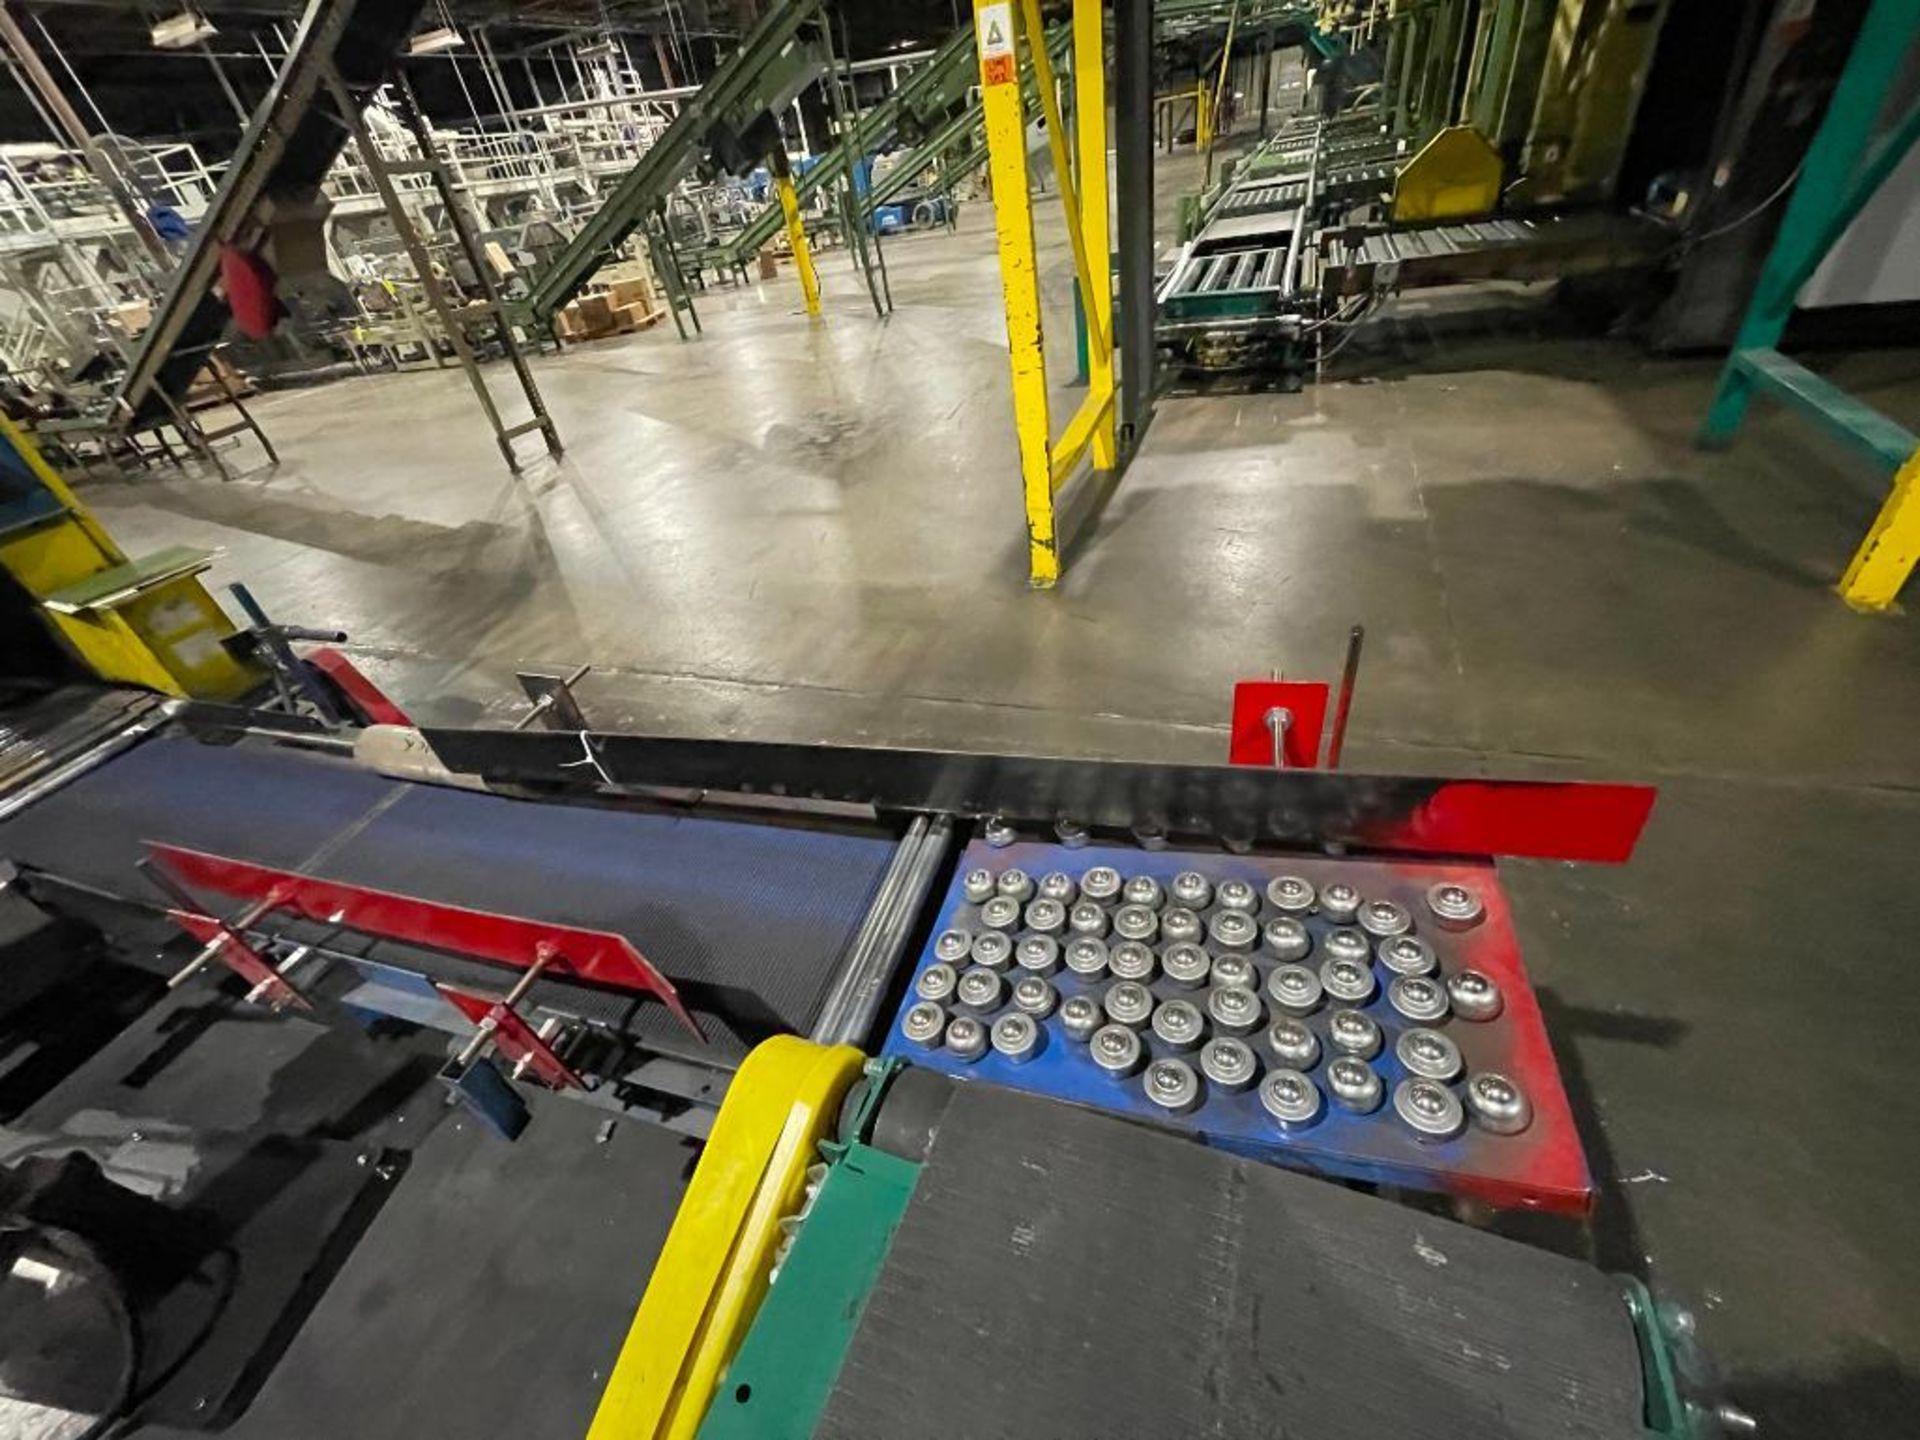 mild steel conveyor - Image 3 of 11